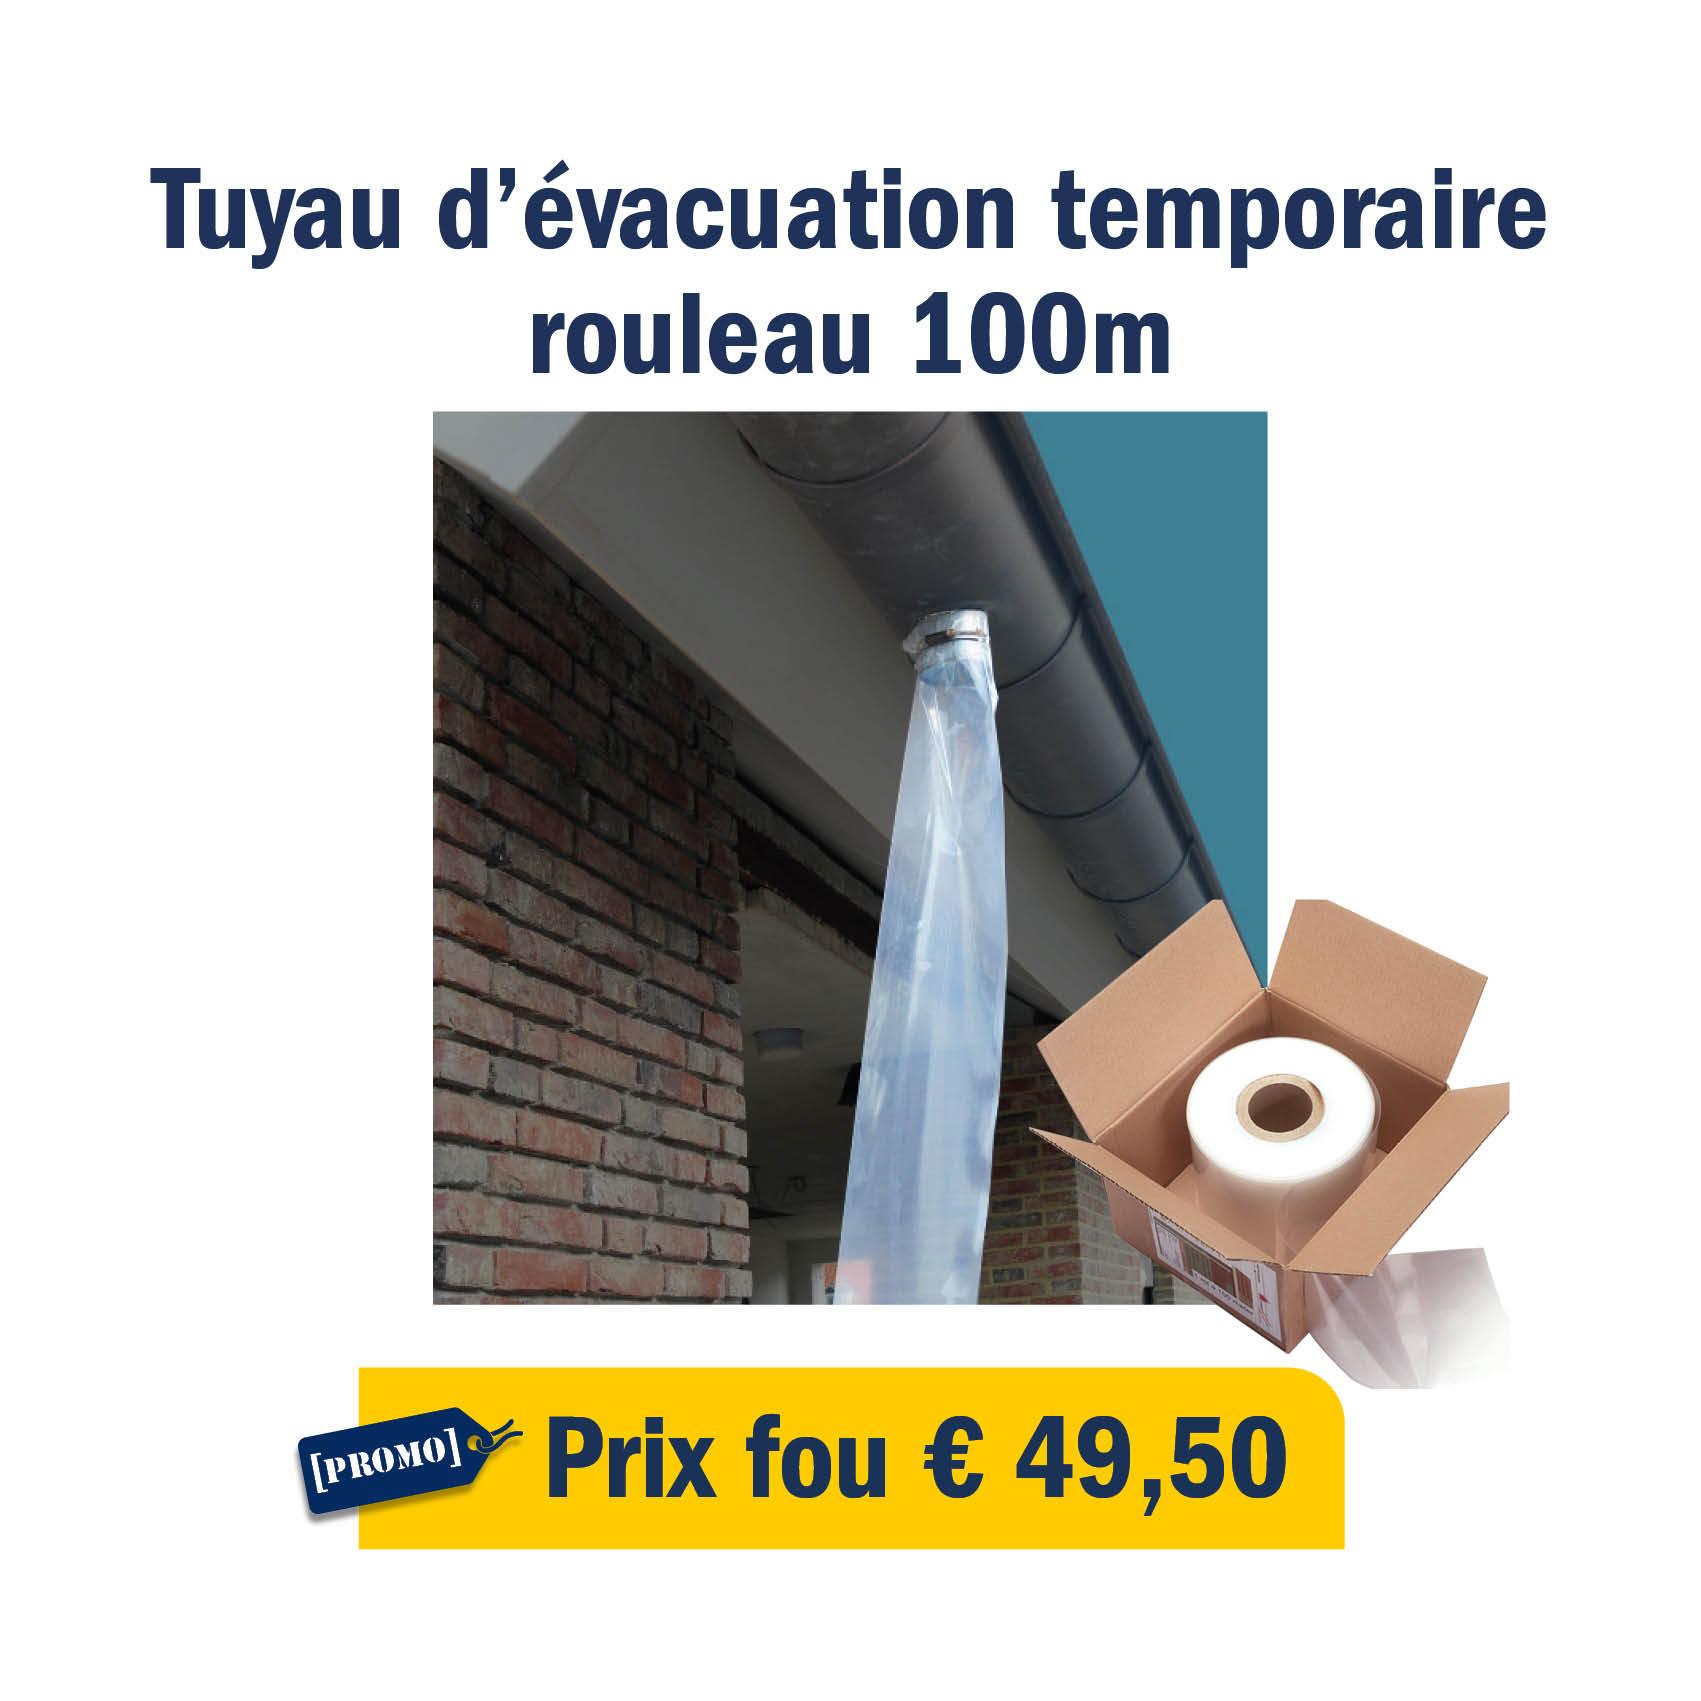 Tuyau d'évacuation temporaire : prix fou de € 49,50